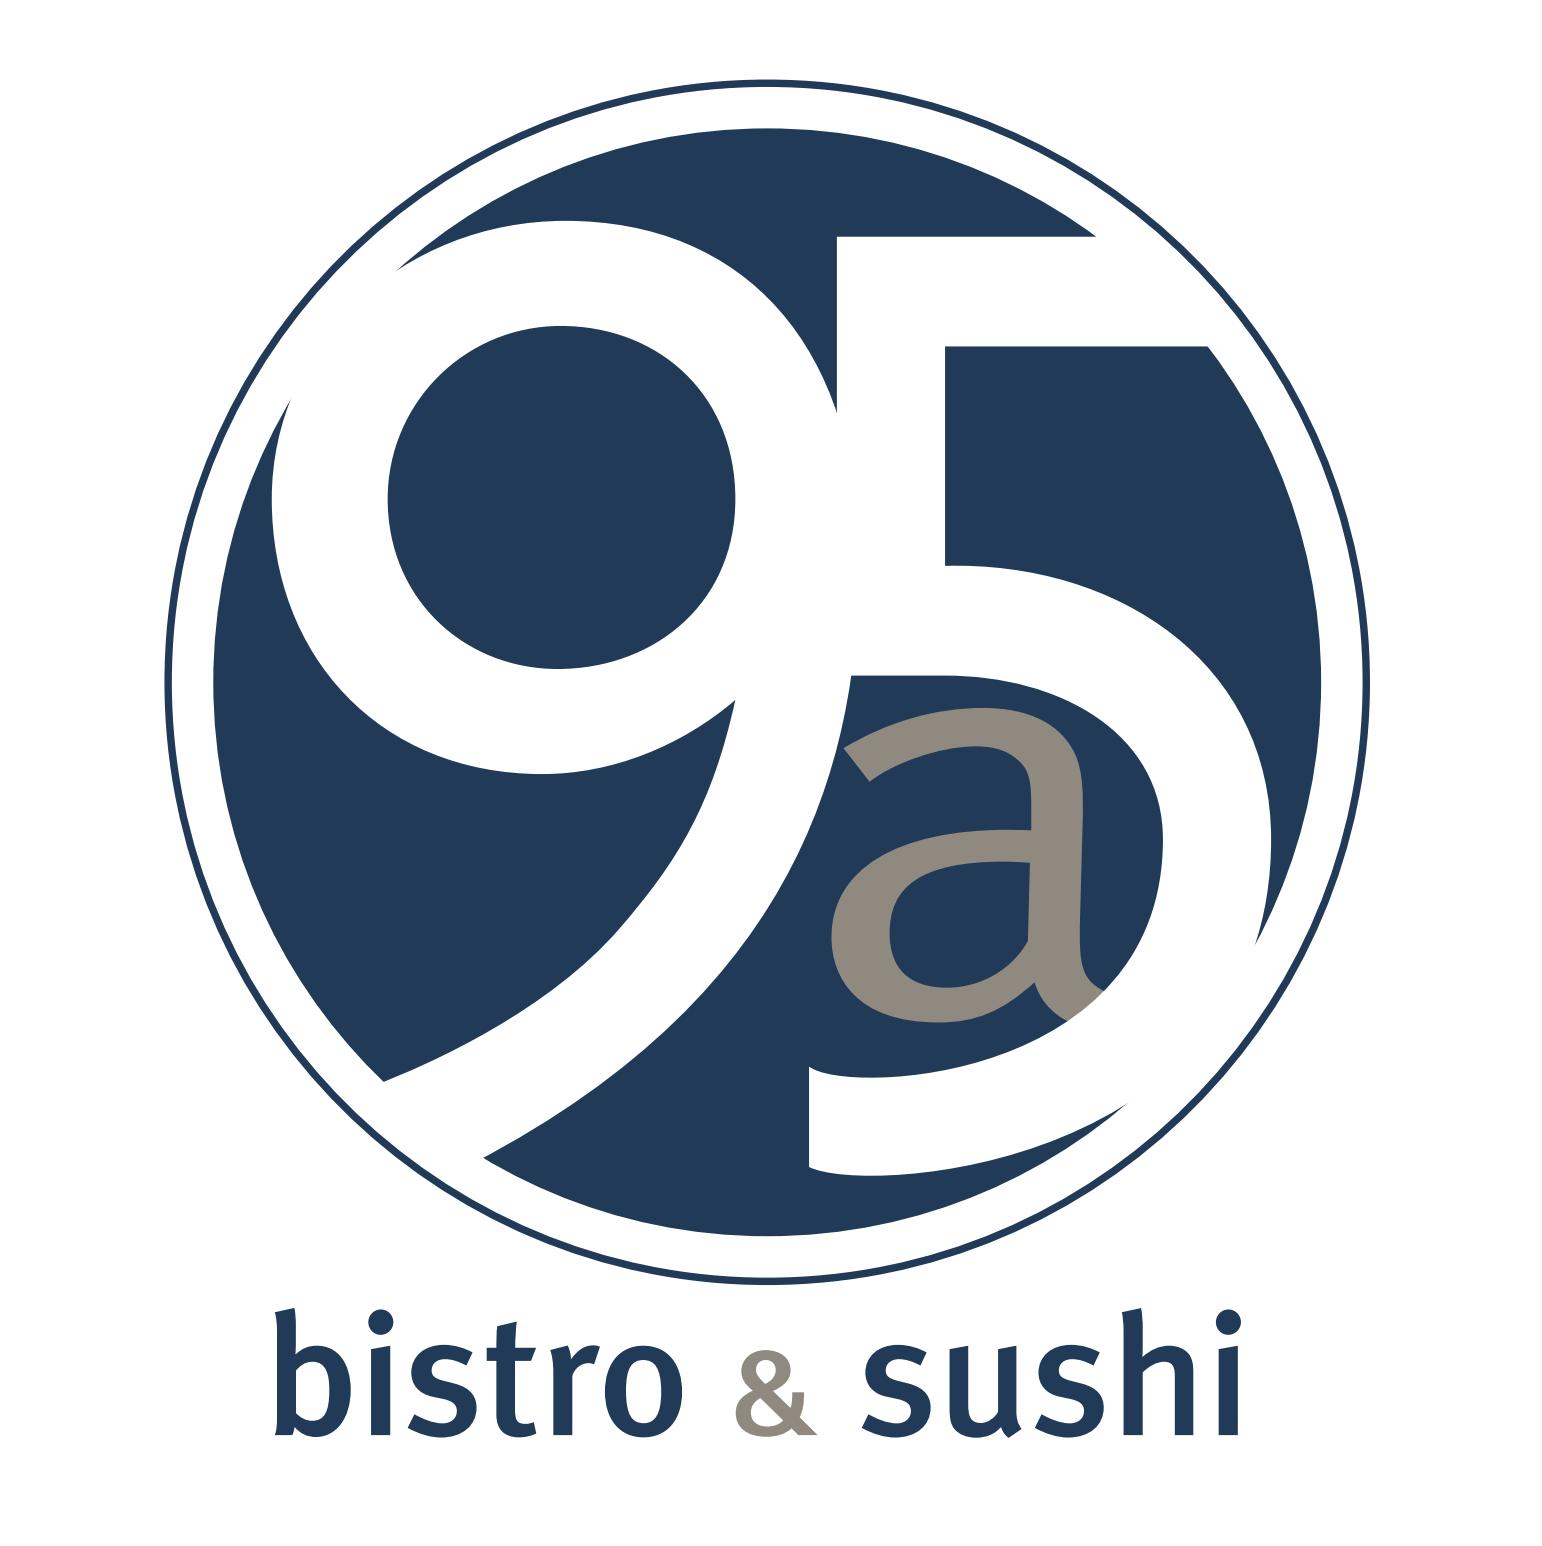 Gold -  95a bistro & sushi - Logo